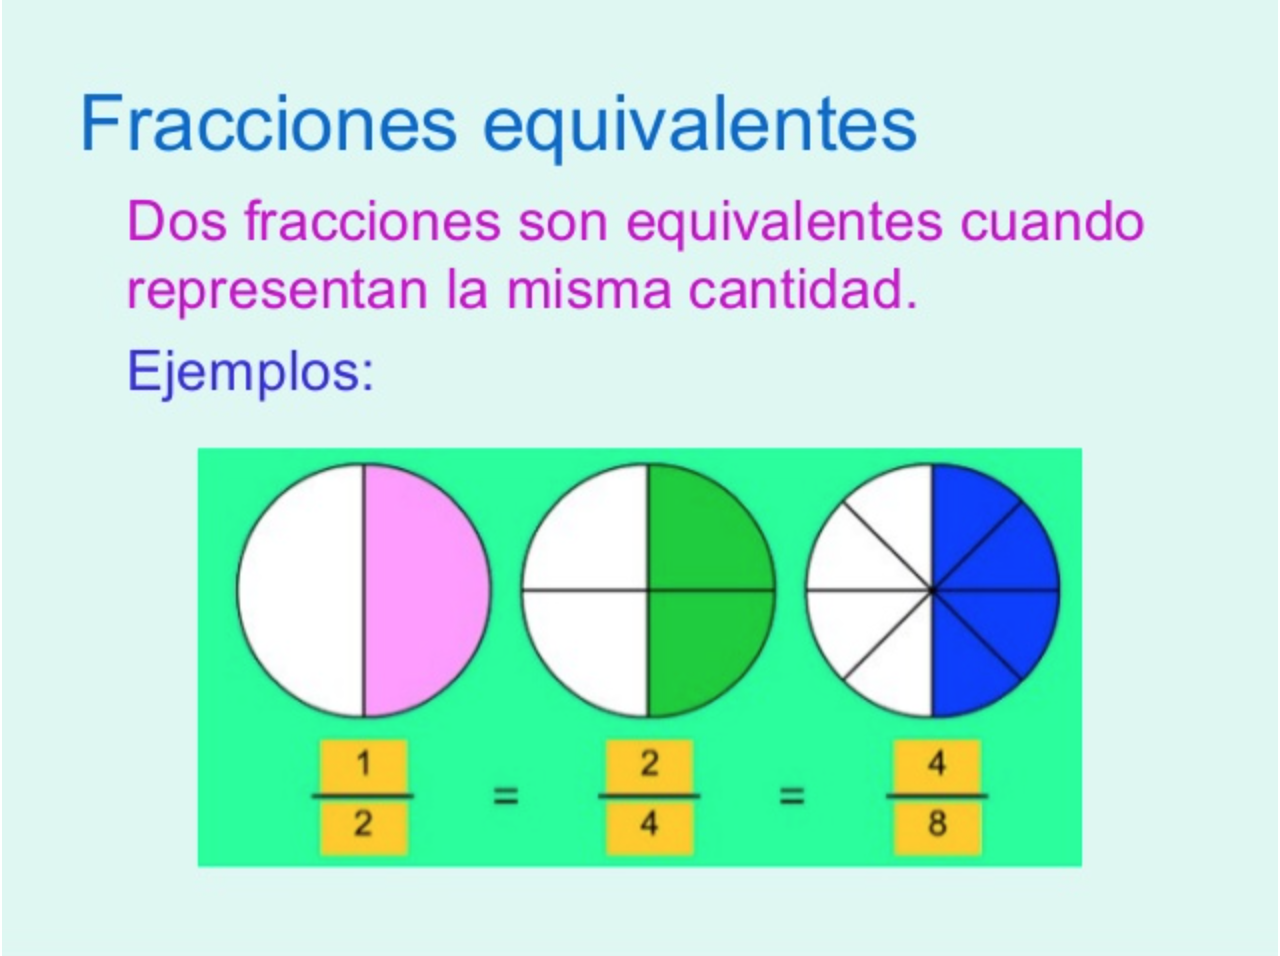 Taquiamila qu son fracciones equivalentes for Definicion de cuarto